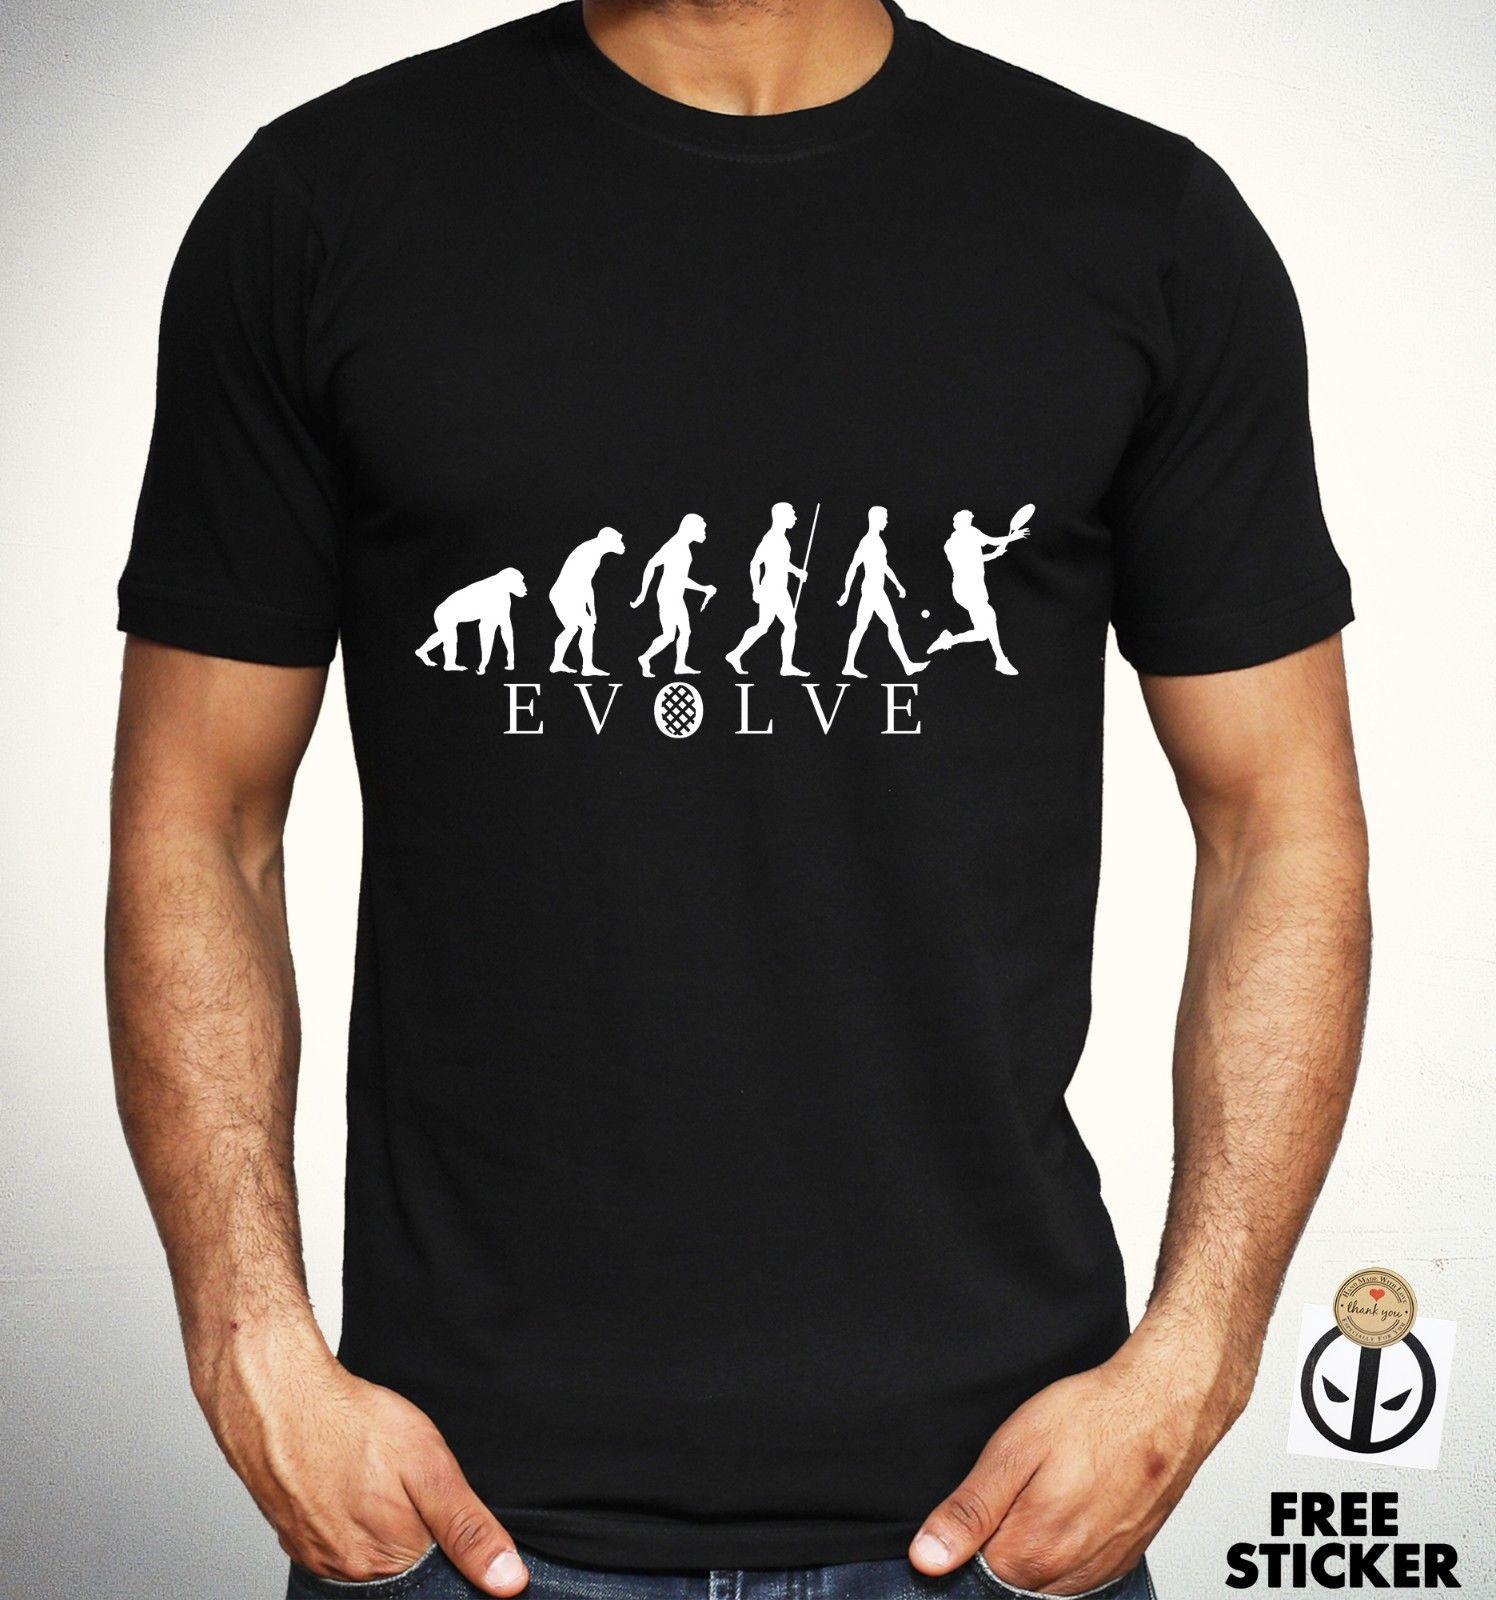 37e934e02 Tennis Evolution T Shirt Funny Human Evolve Tee Sports Novelty Fashion Top  Mens Fun Tee Daily Tee Shirts From Allthingsgood, $11.01| DHgate.Com